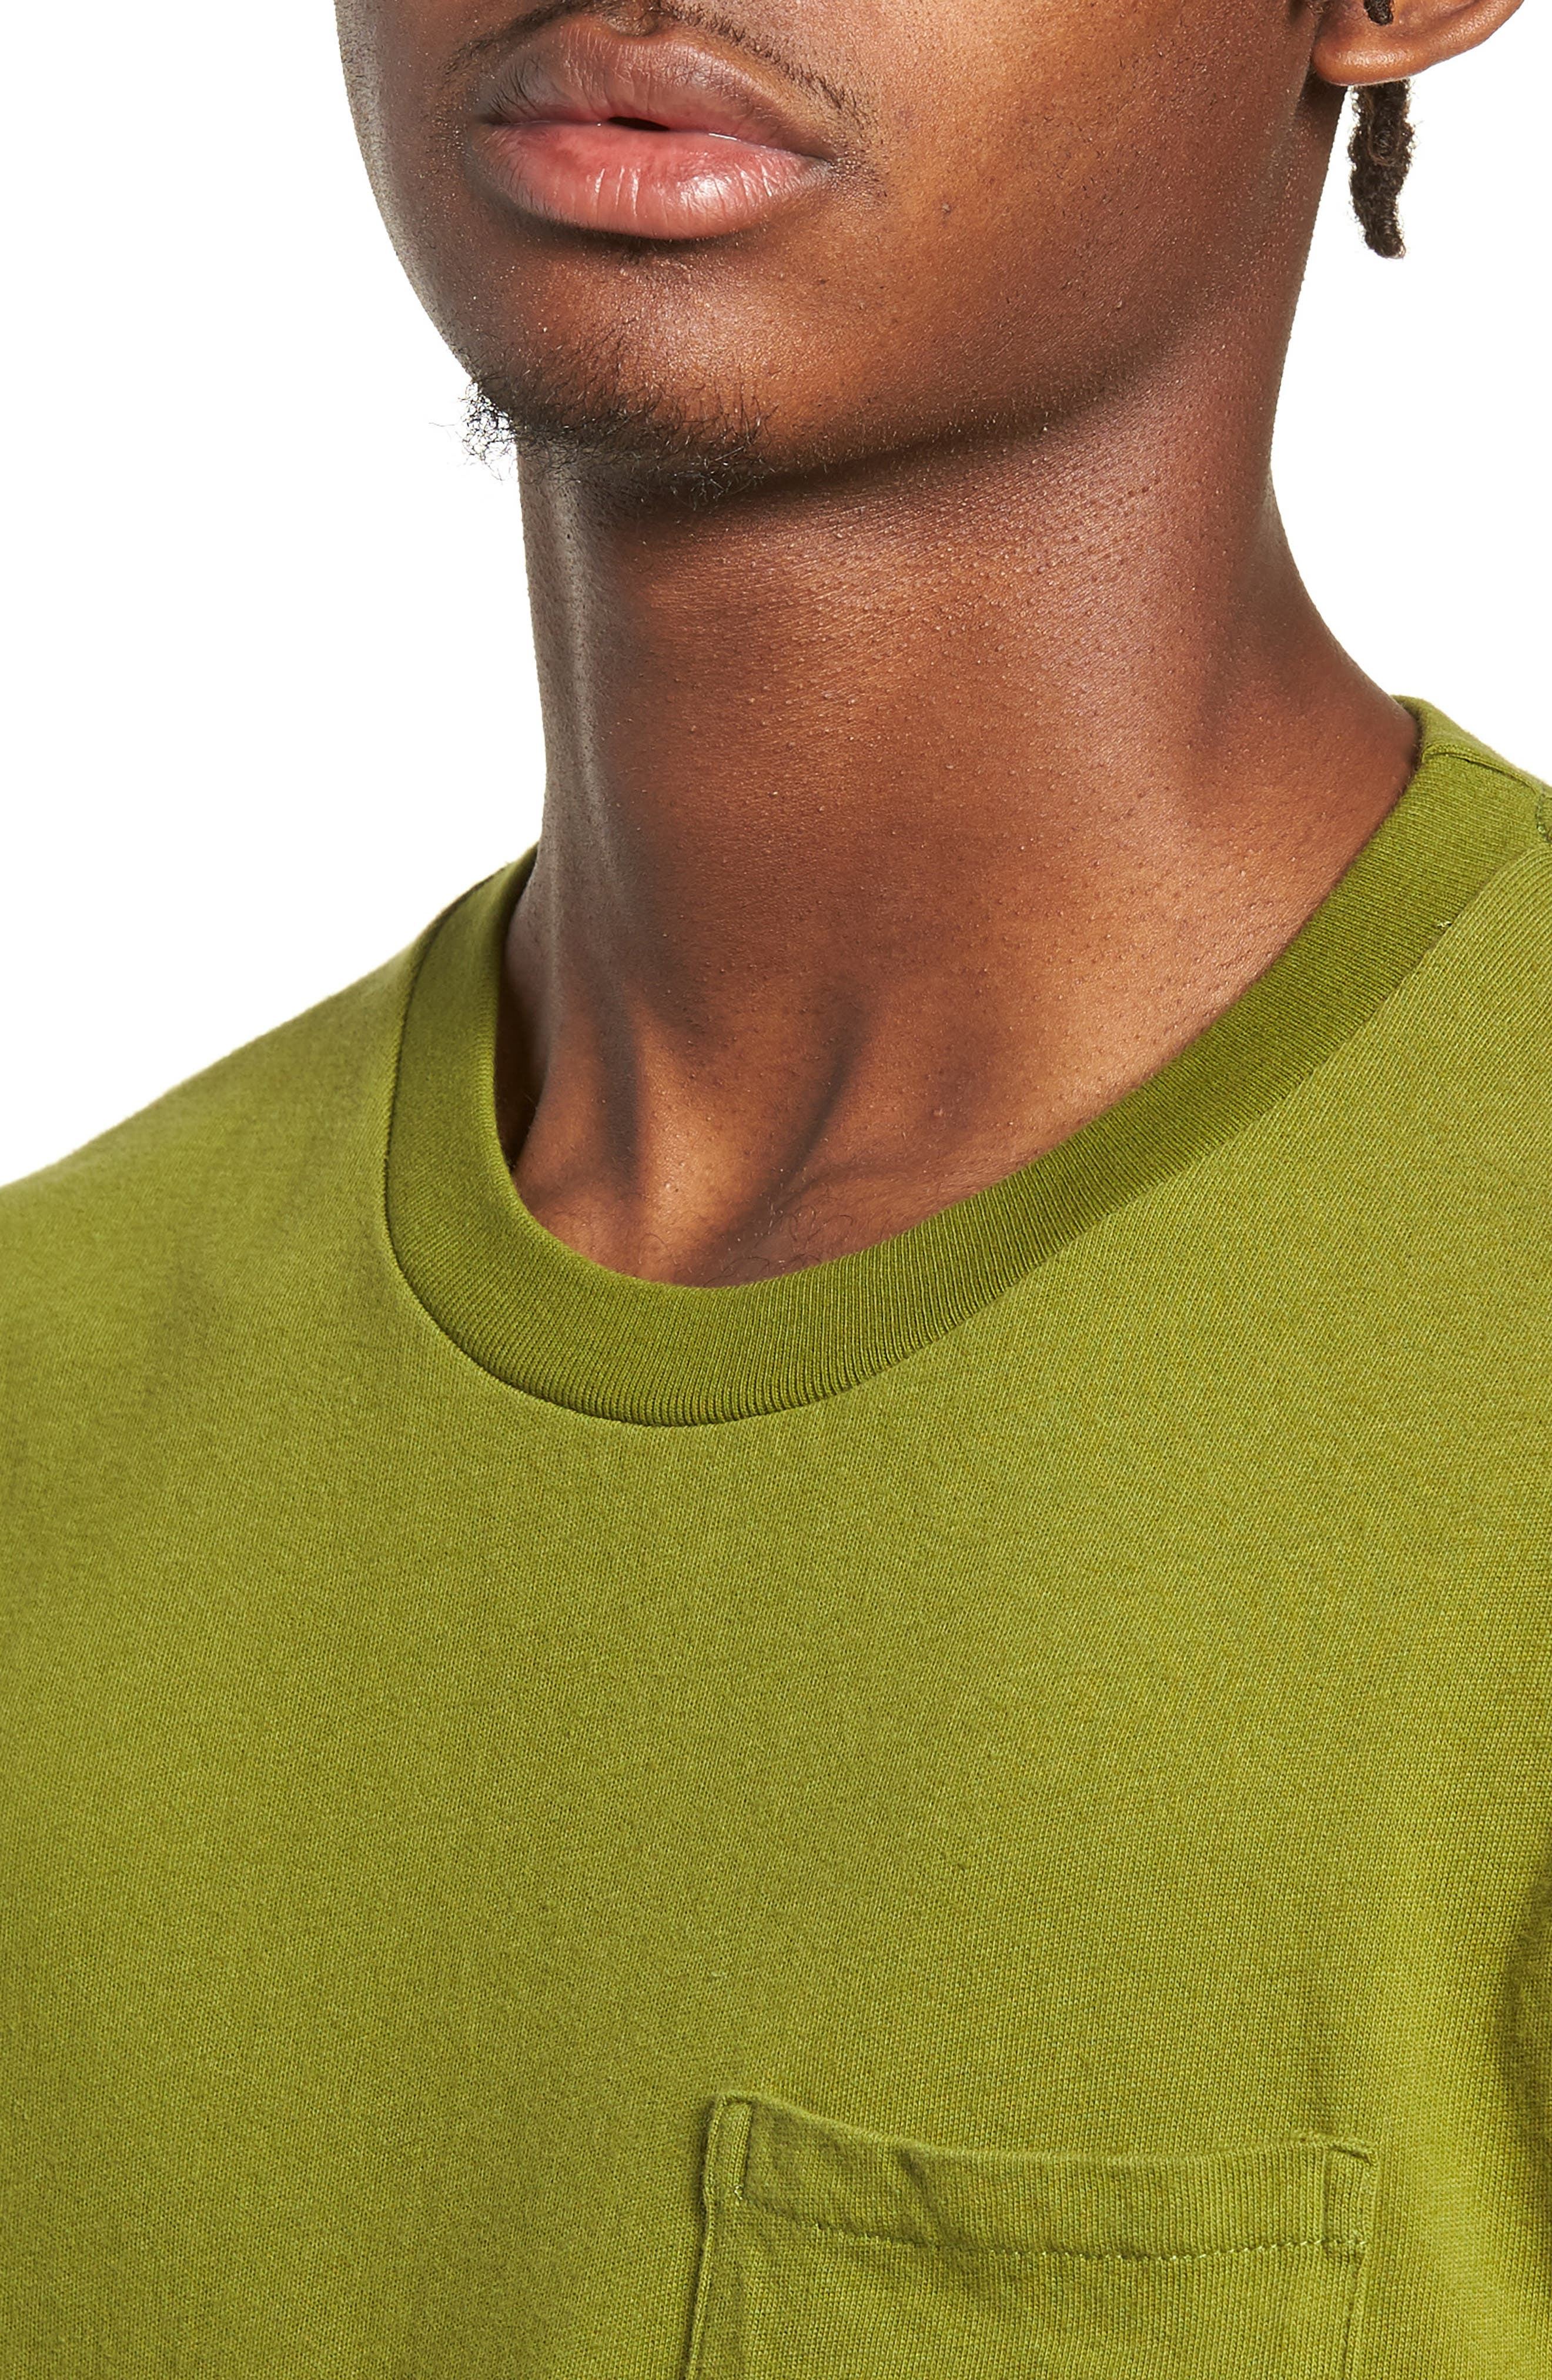 1950s Slim Fit Colorblock T-Shirt,                             Alternate thumbnail 4, color,                             3 WAY MULTI STRIPE